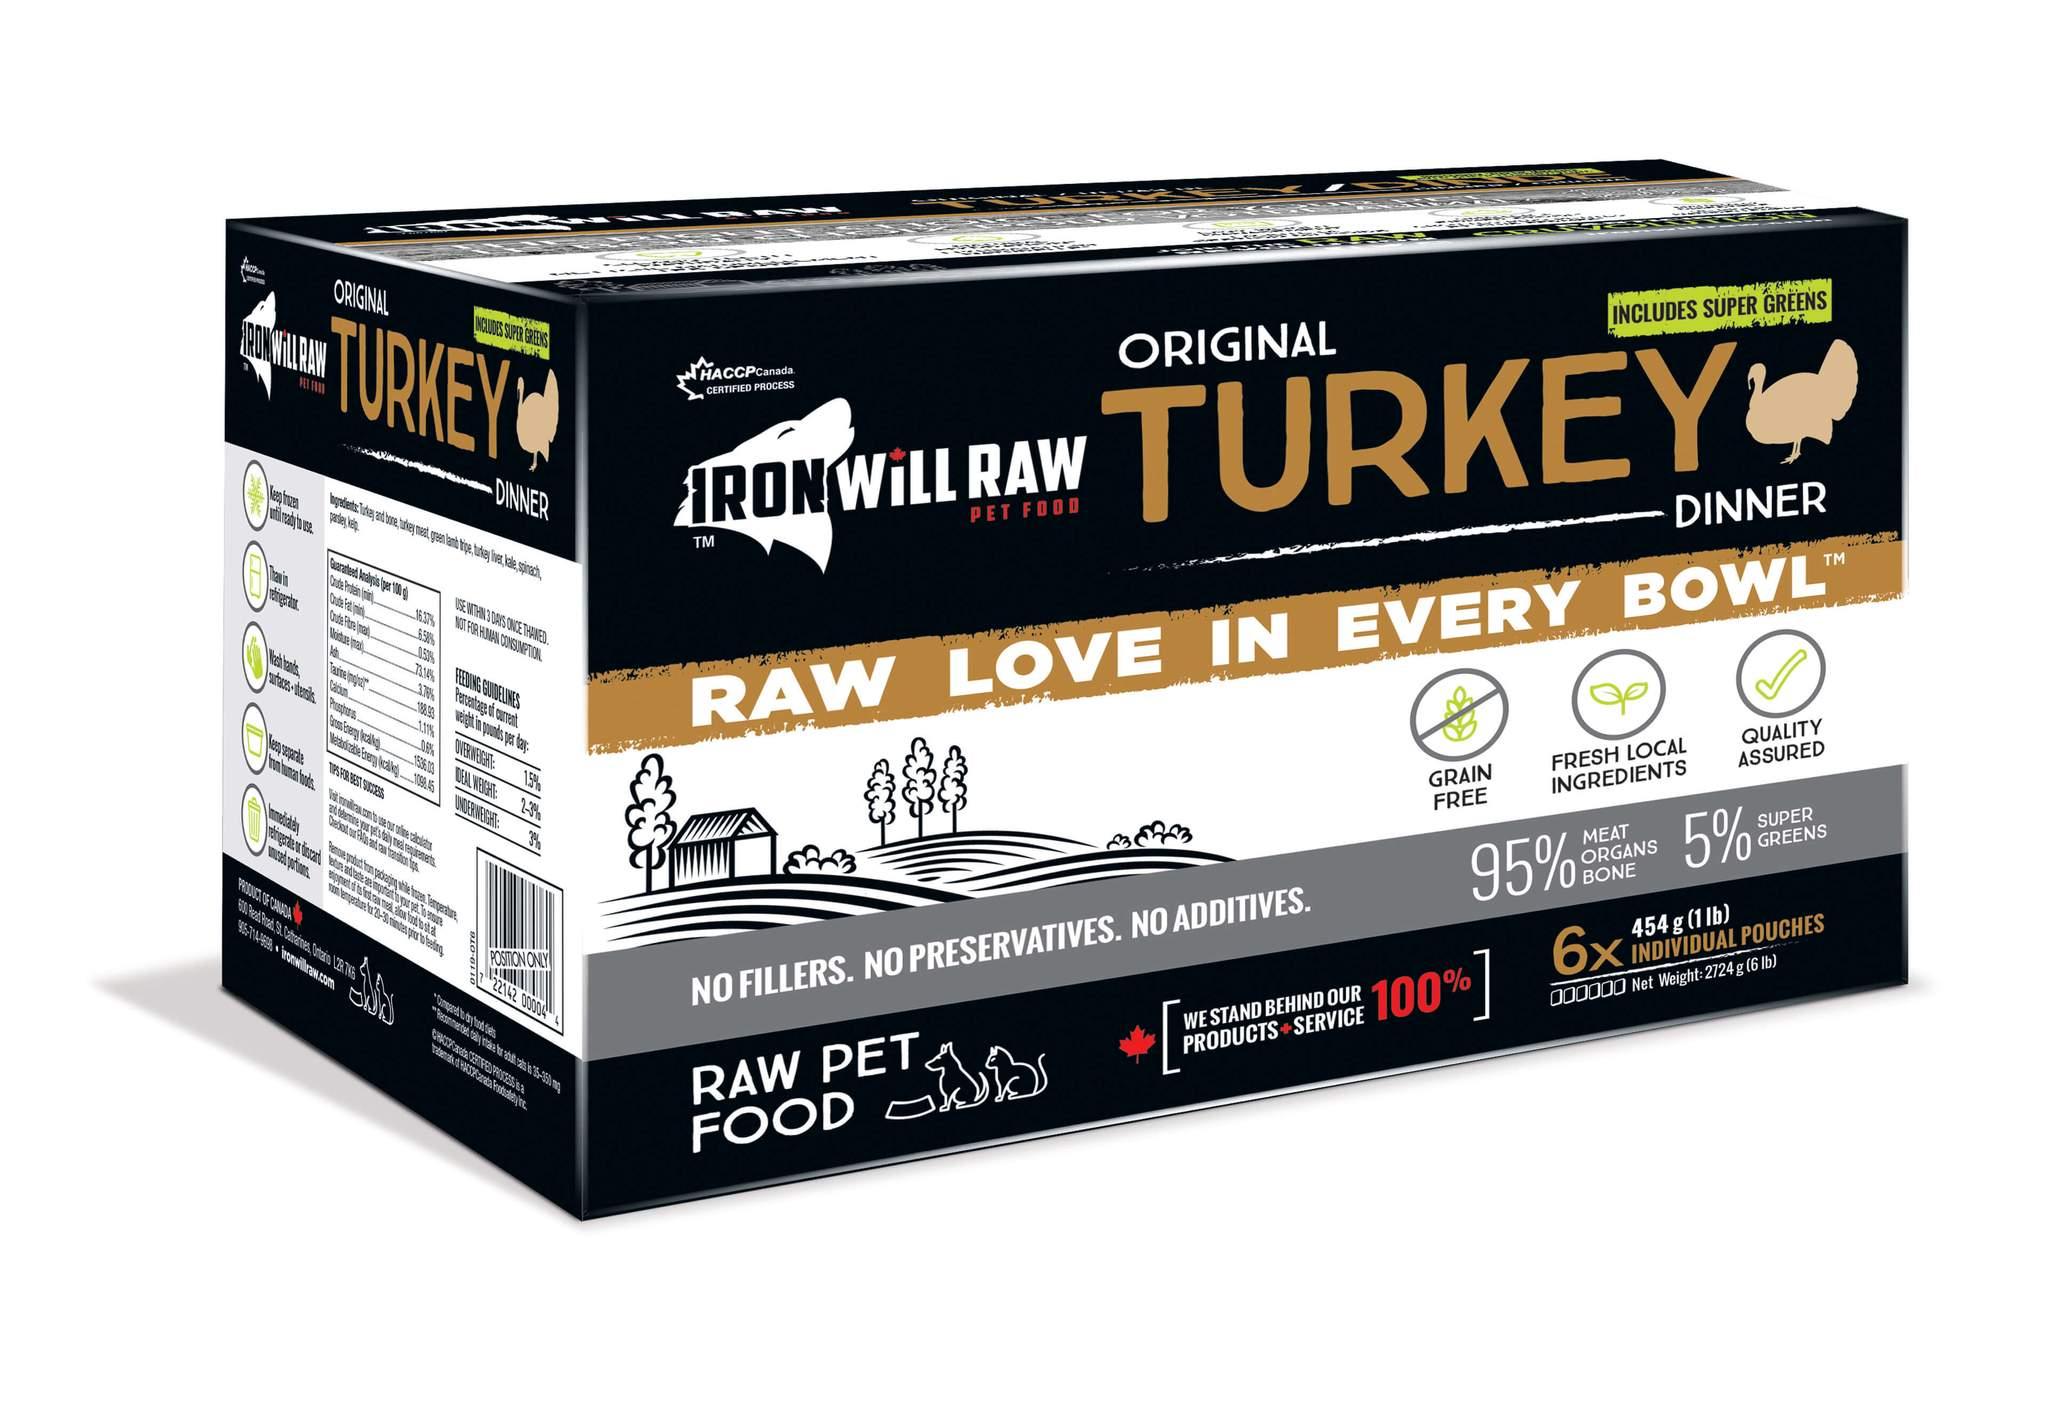 Iron Will Raw Original Turkey Frozen Cat & Dog Food, 6-lb